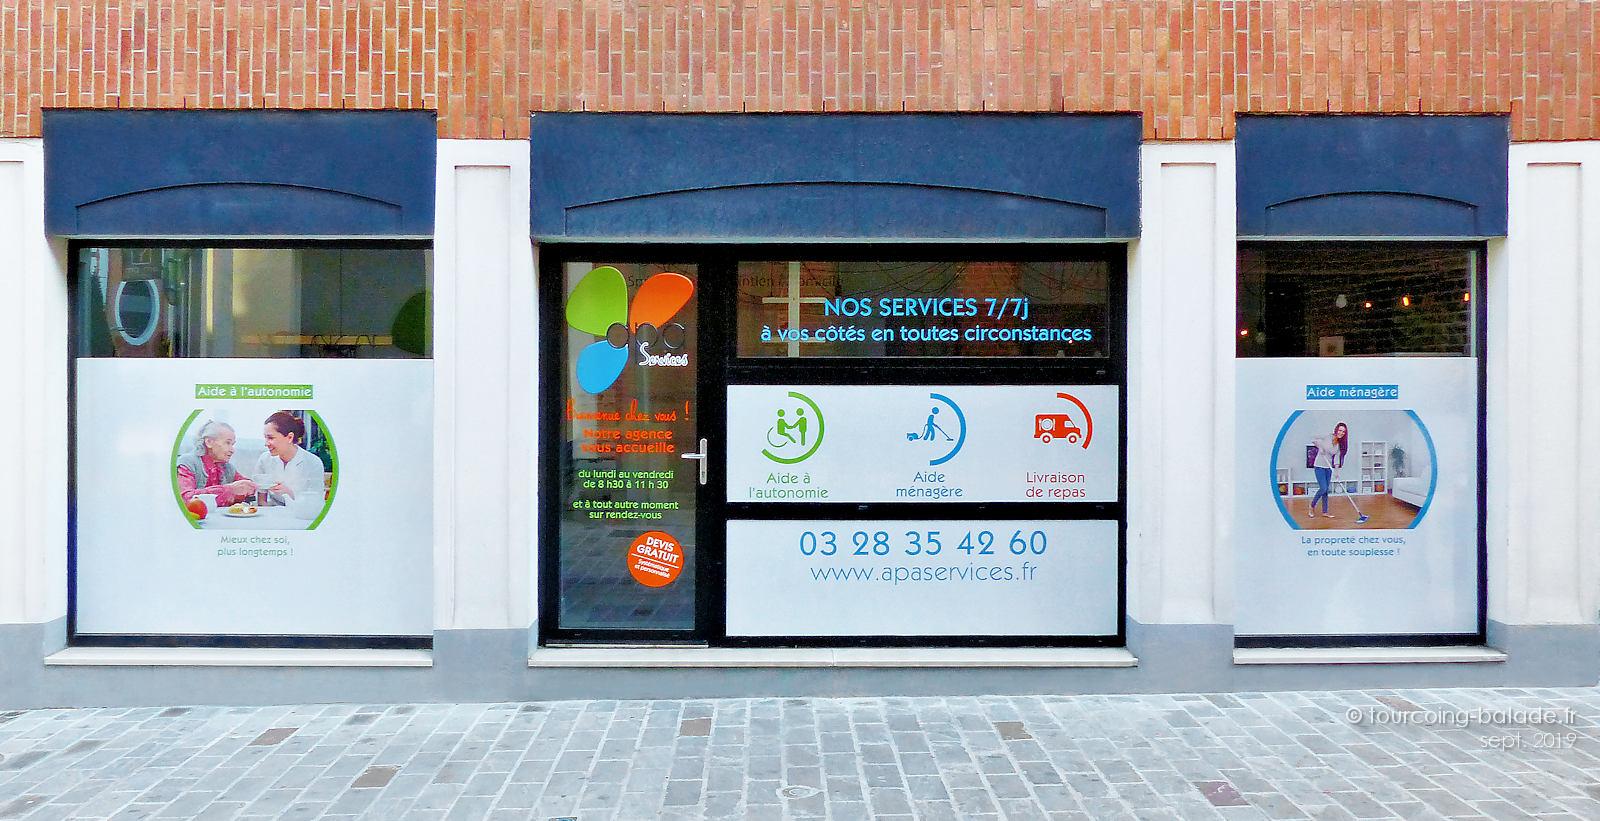 apa services - Agence de Tourcoing Centre, rue du Haze